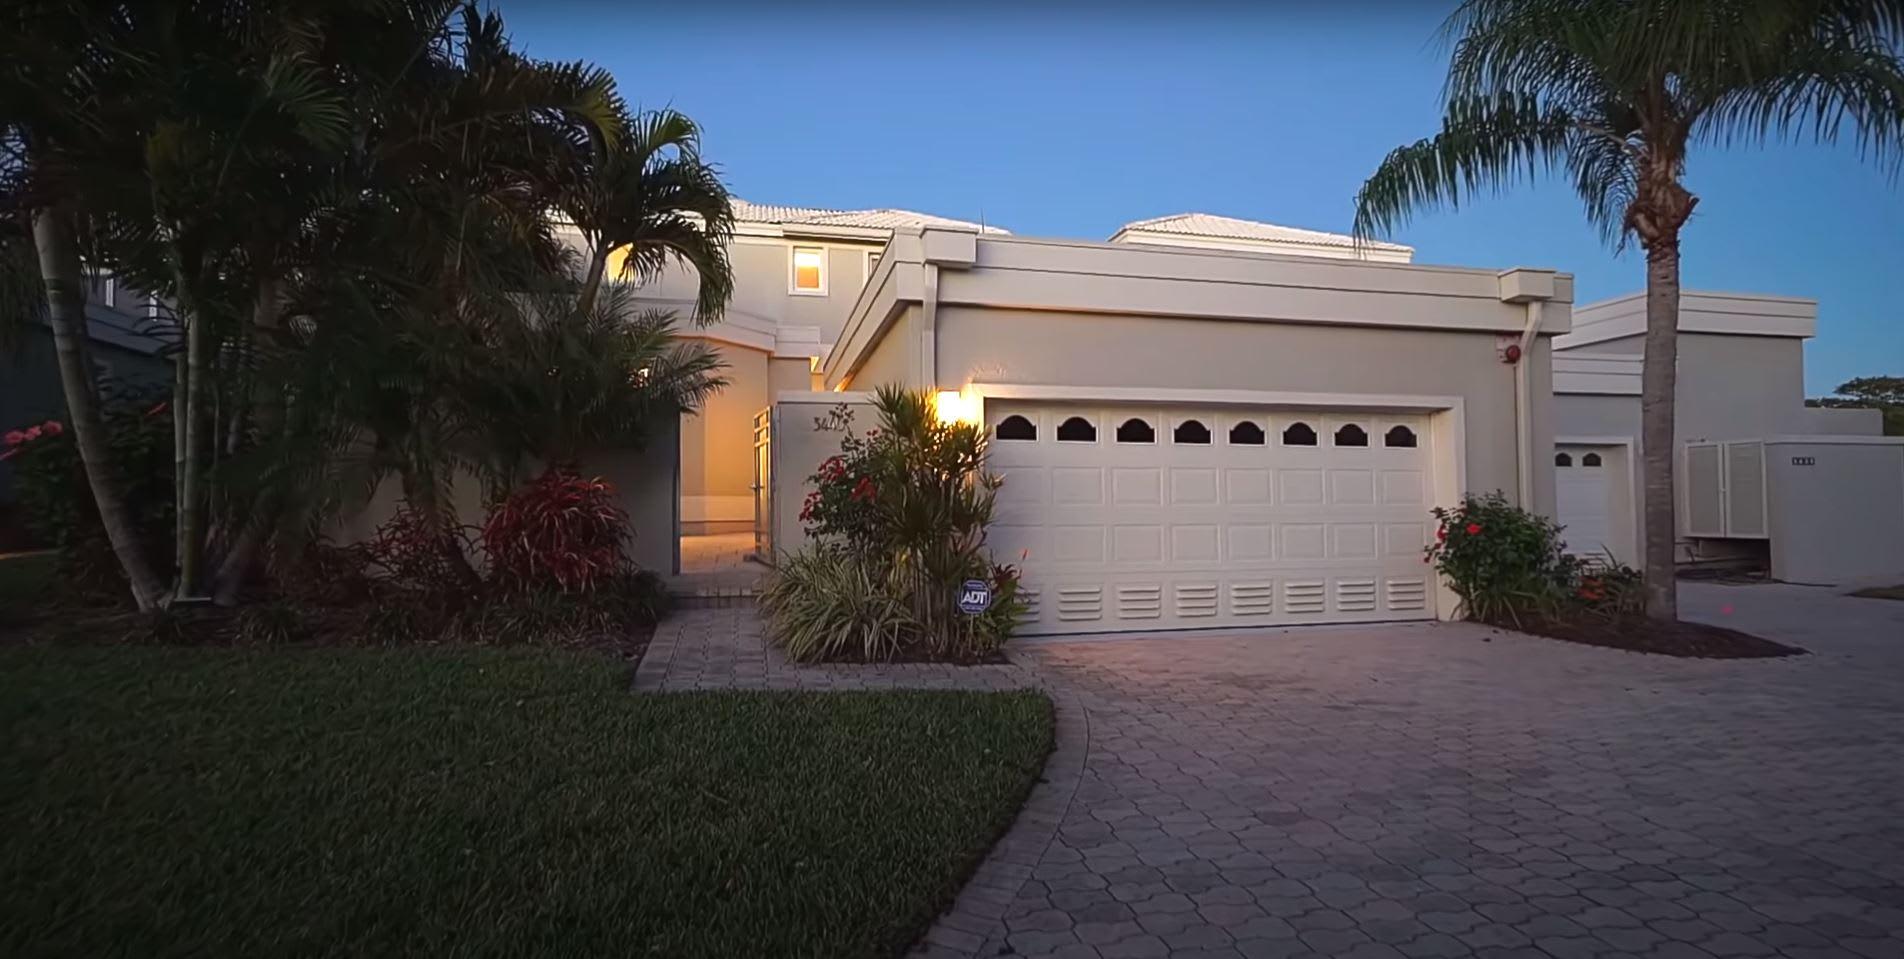 3440 Mistletoe Lane, Corey's Landing, Longboat Key, Florida - For Sale By Roger Pettingell video preview